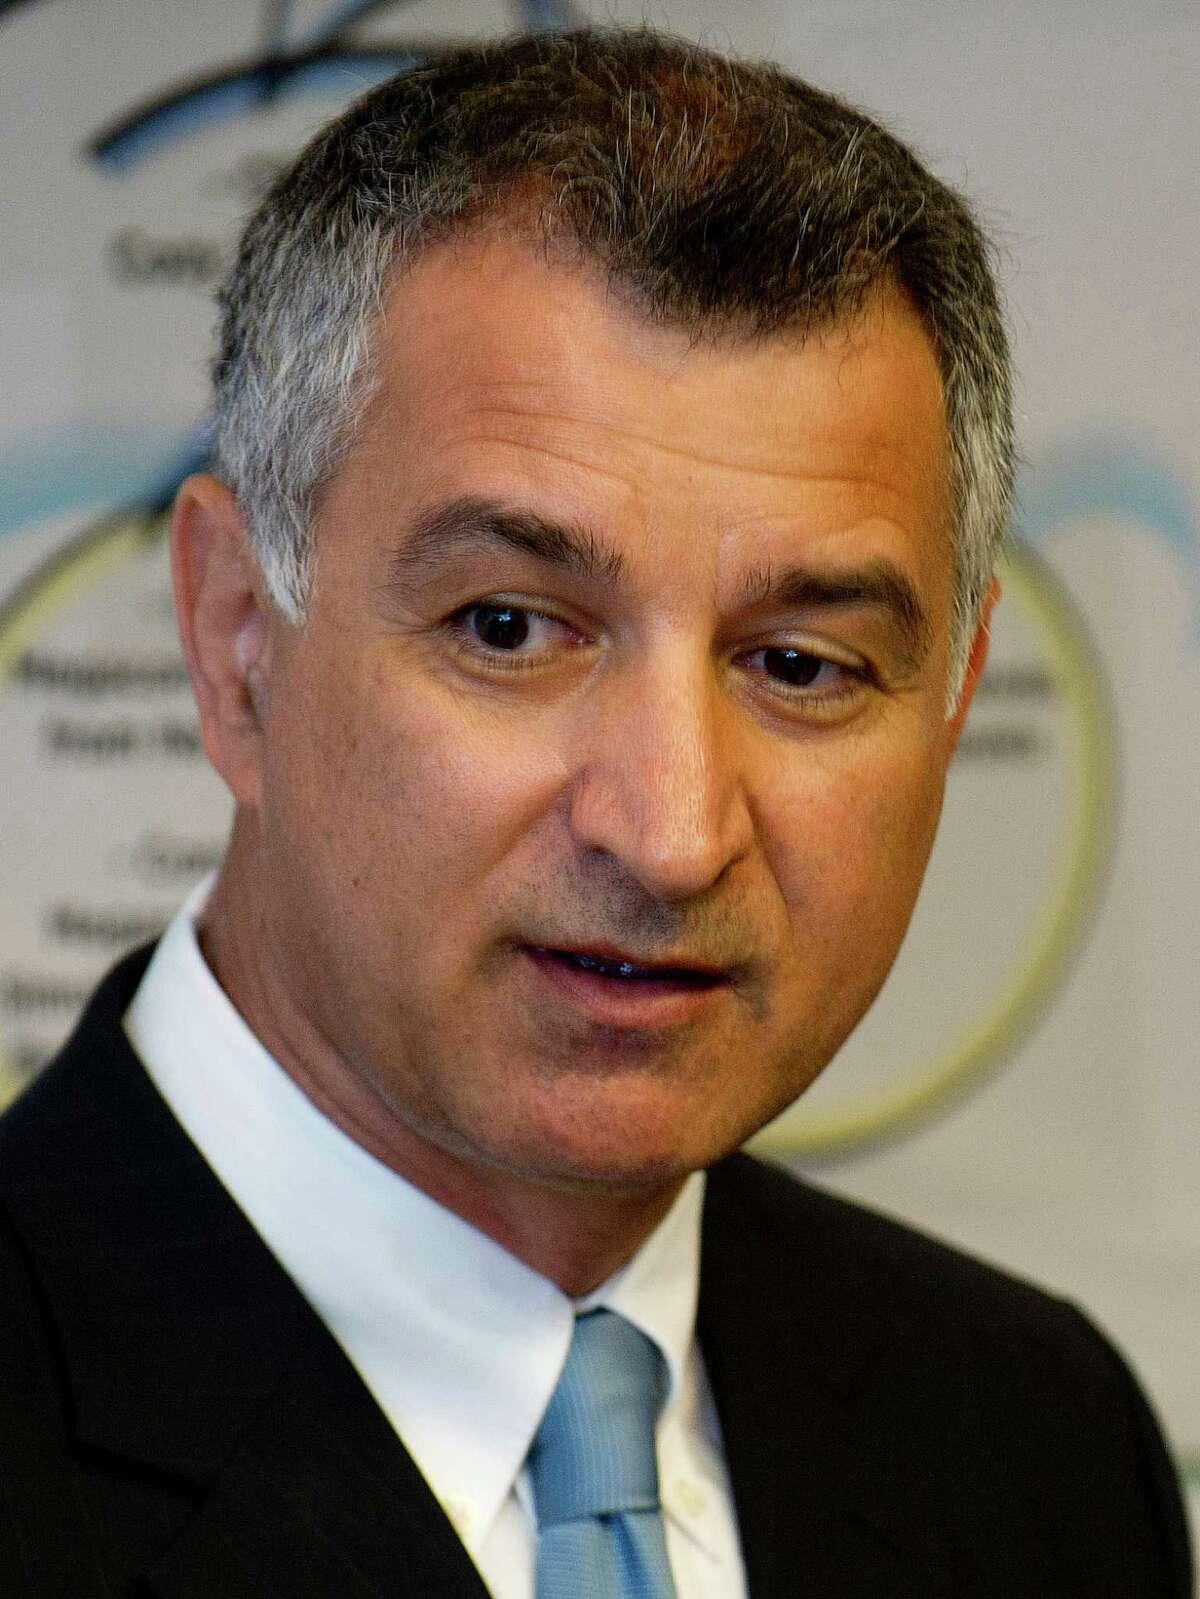 State Senator Carlo Leone